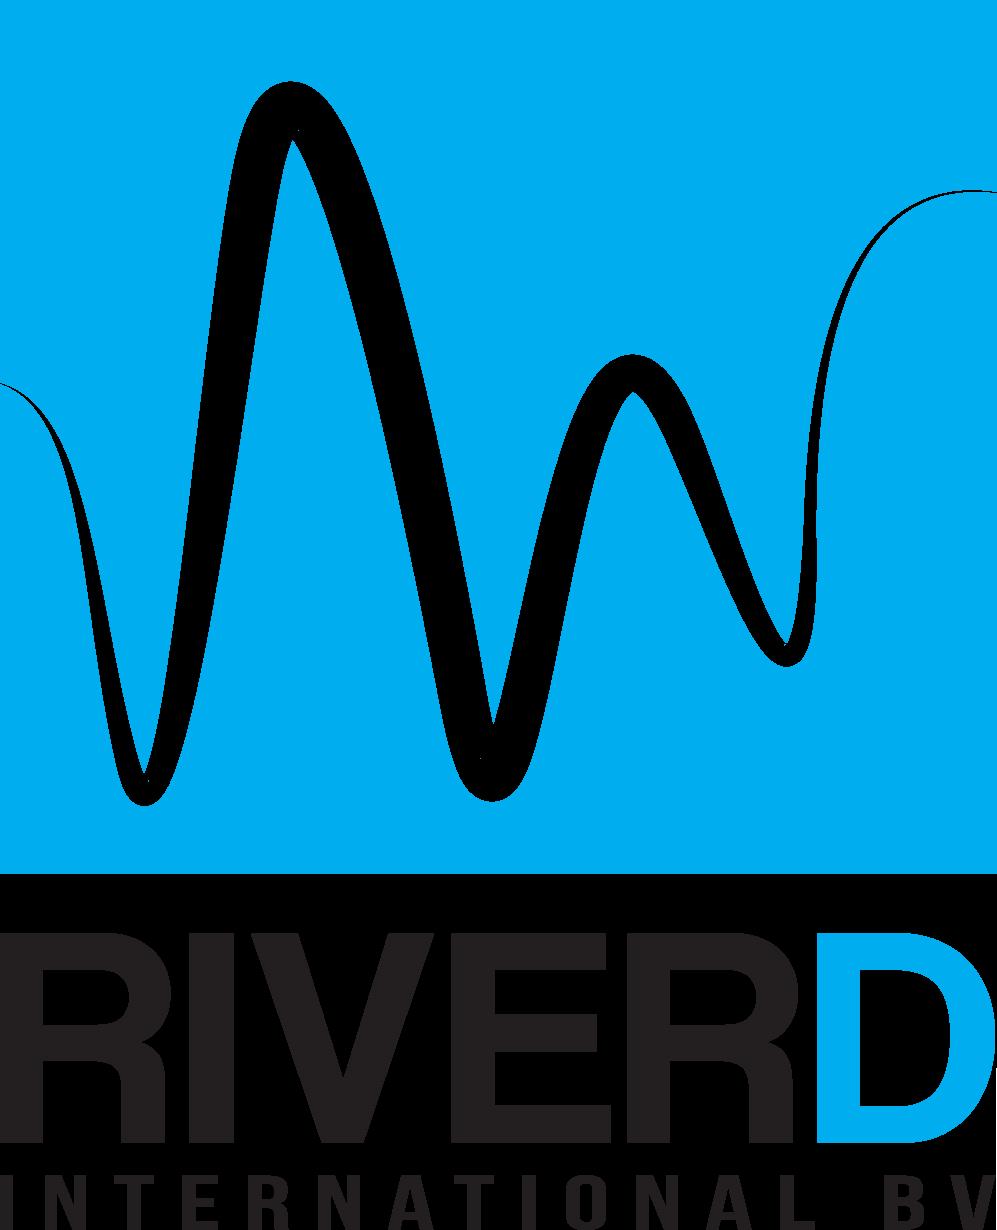 riverd